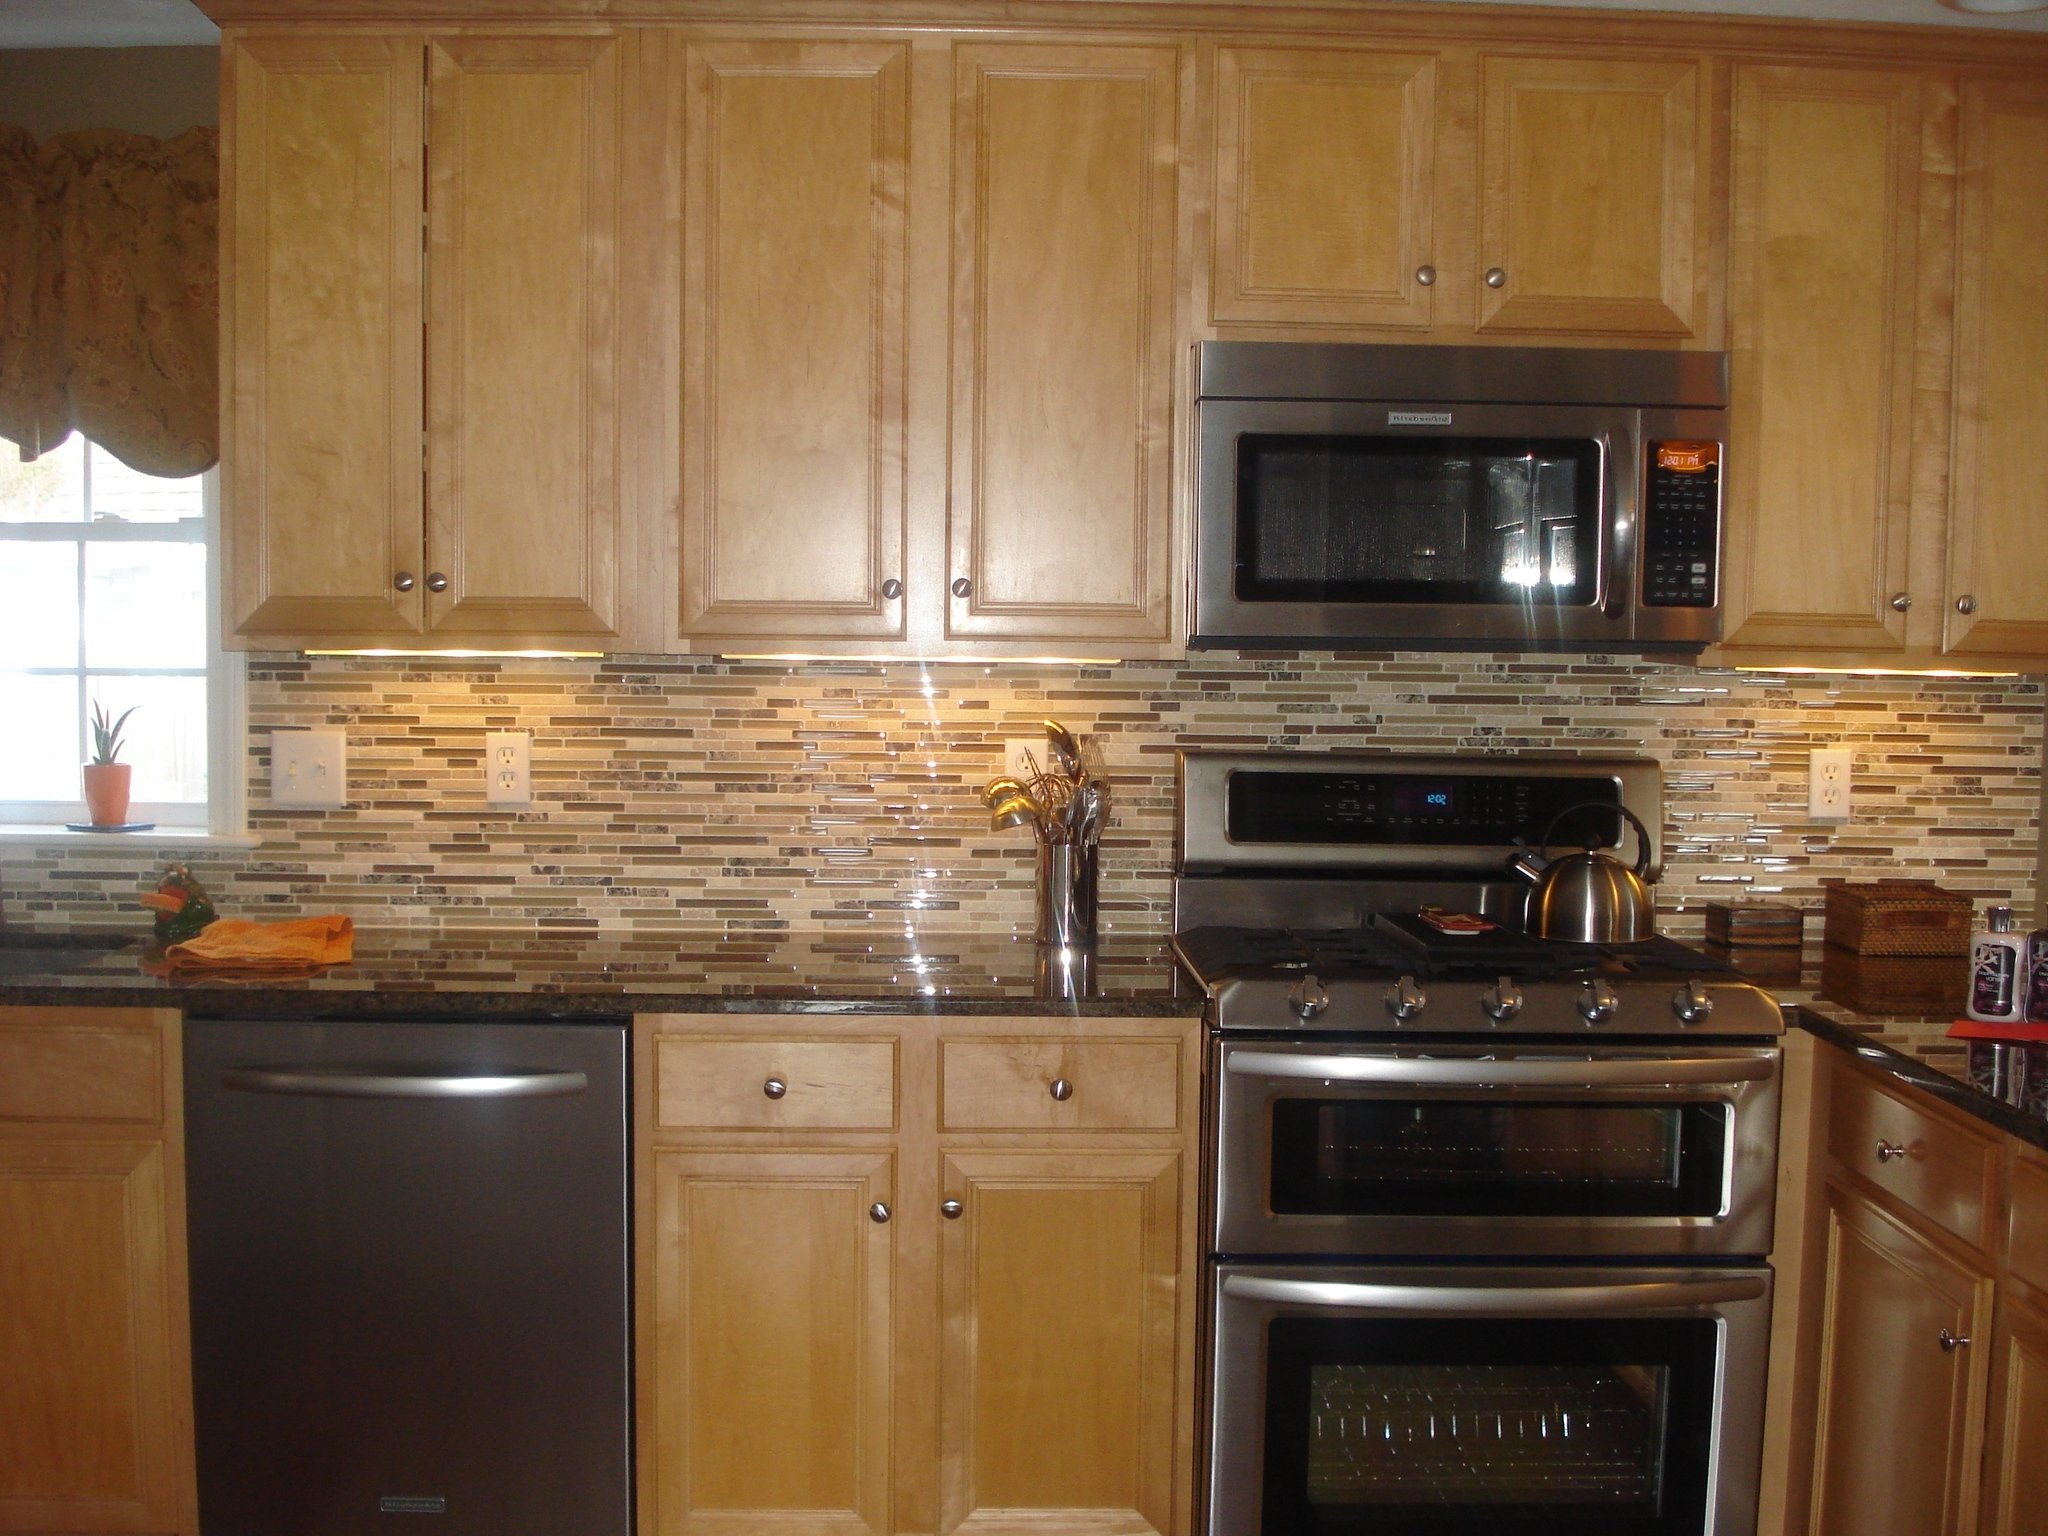 10 Gorgeous Backsplash Ideas For Black Granite Countertops black granite countertop and backsplash ideas with wooden cabinet 1 2020